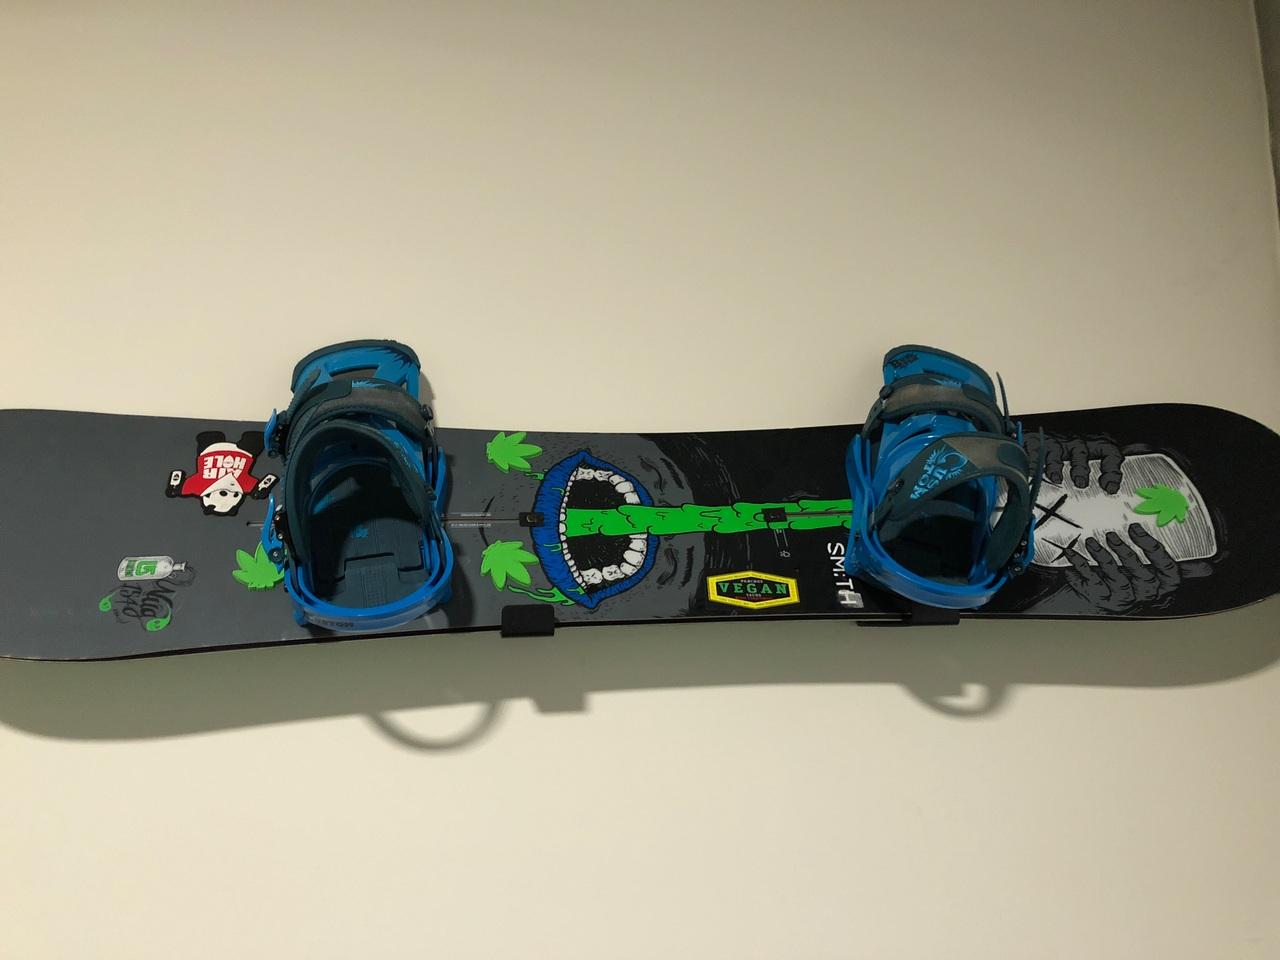 Naked Snow  Minimalist Snowboard Rack - Storeyourboardcom-2762